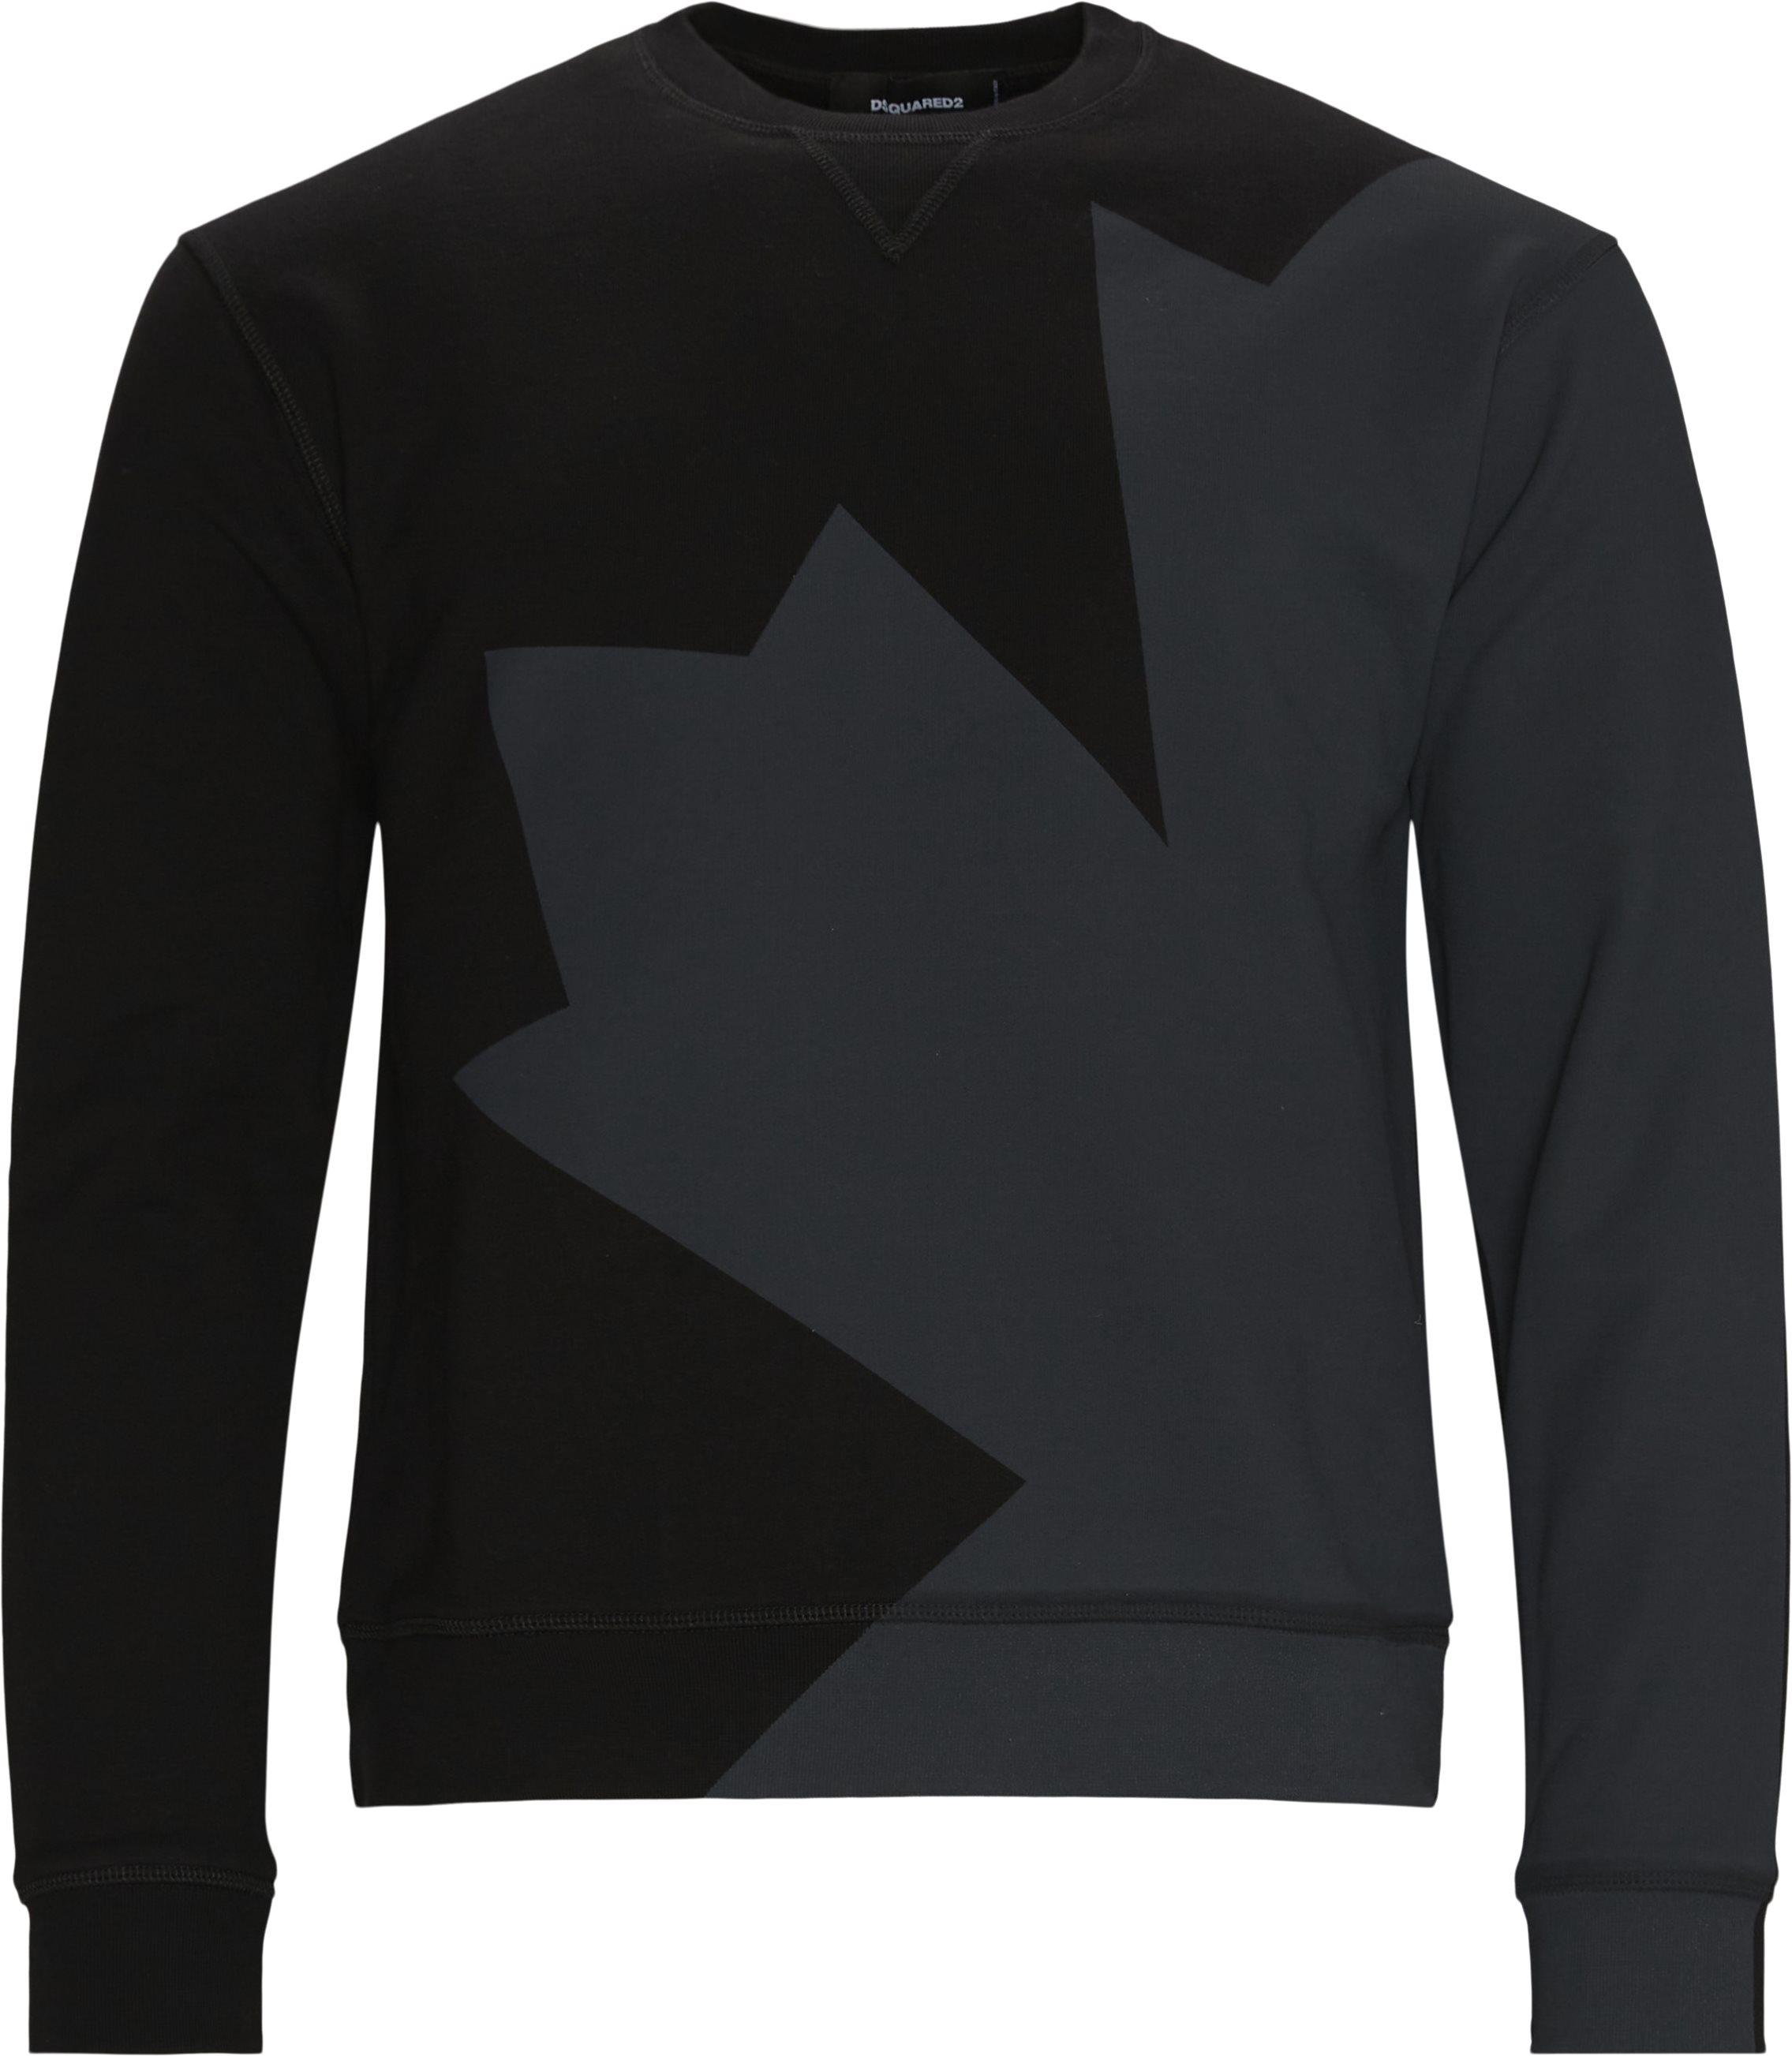 Crewneck Sweat - Sweatshirts - Regular fit - Sort